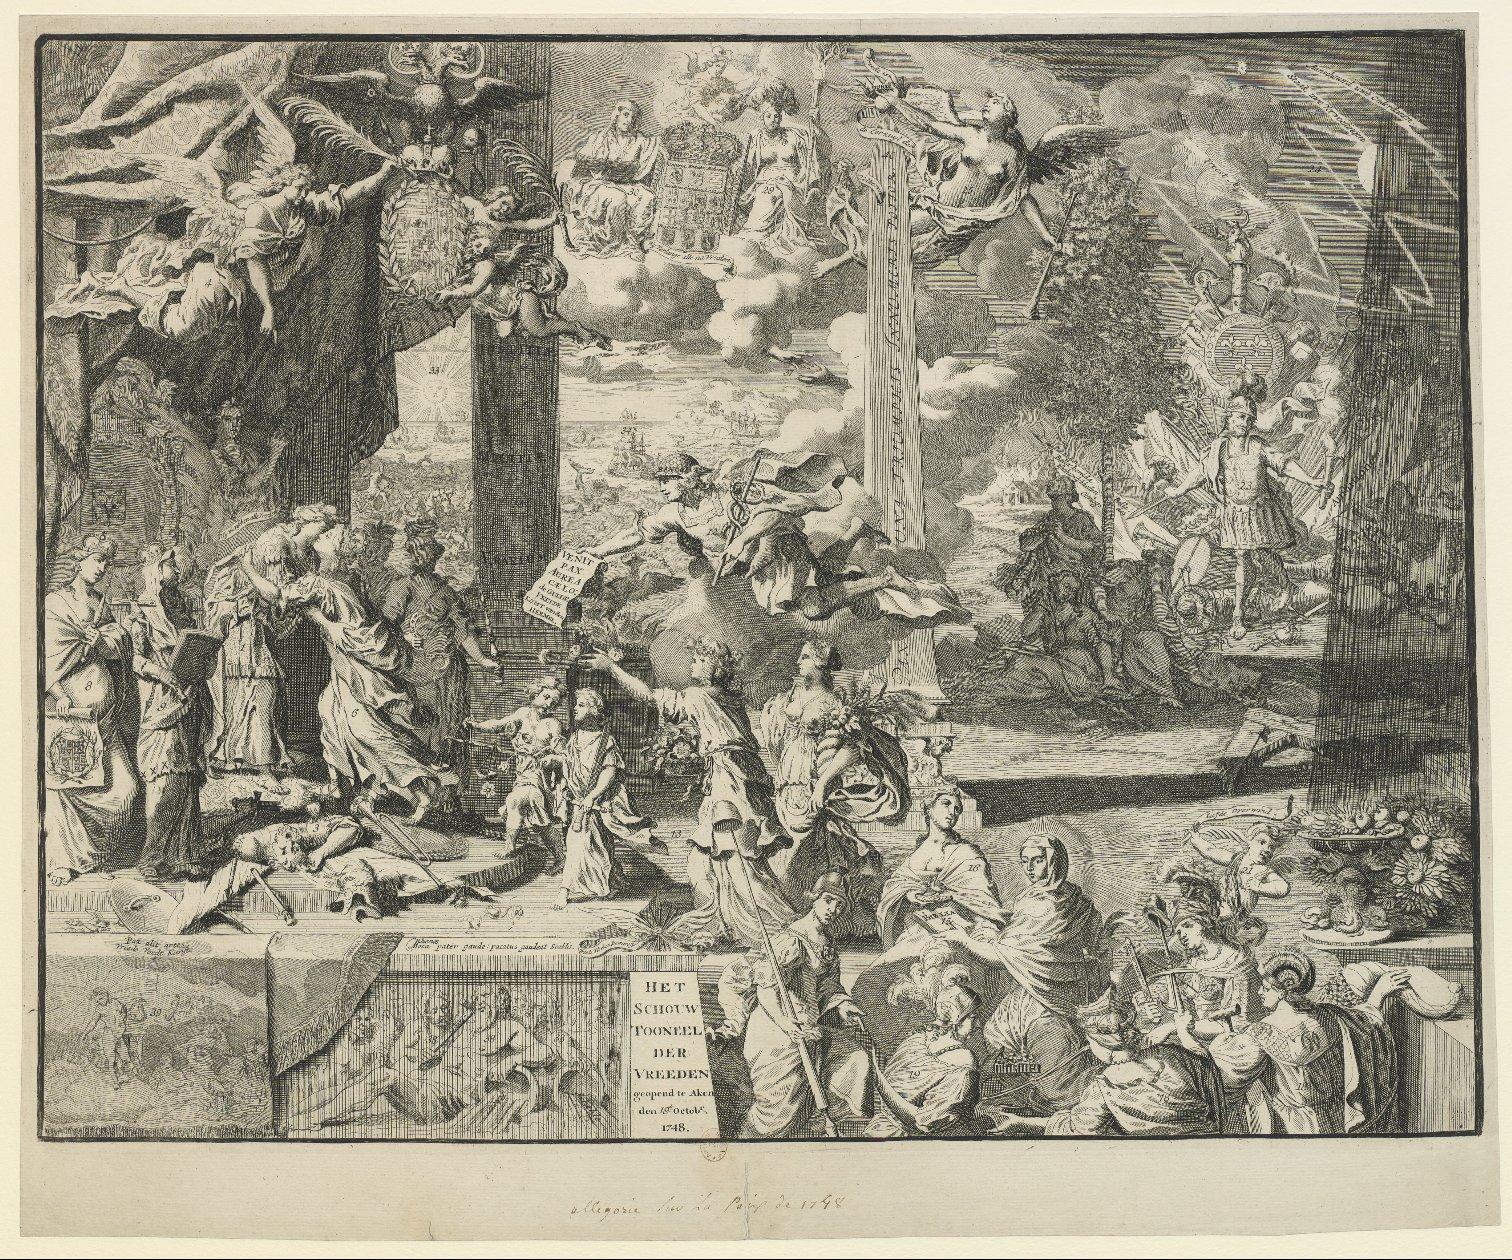 File:Allegorie frieden aachen 1748.jpg